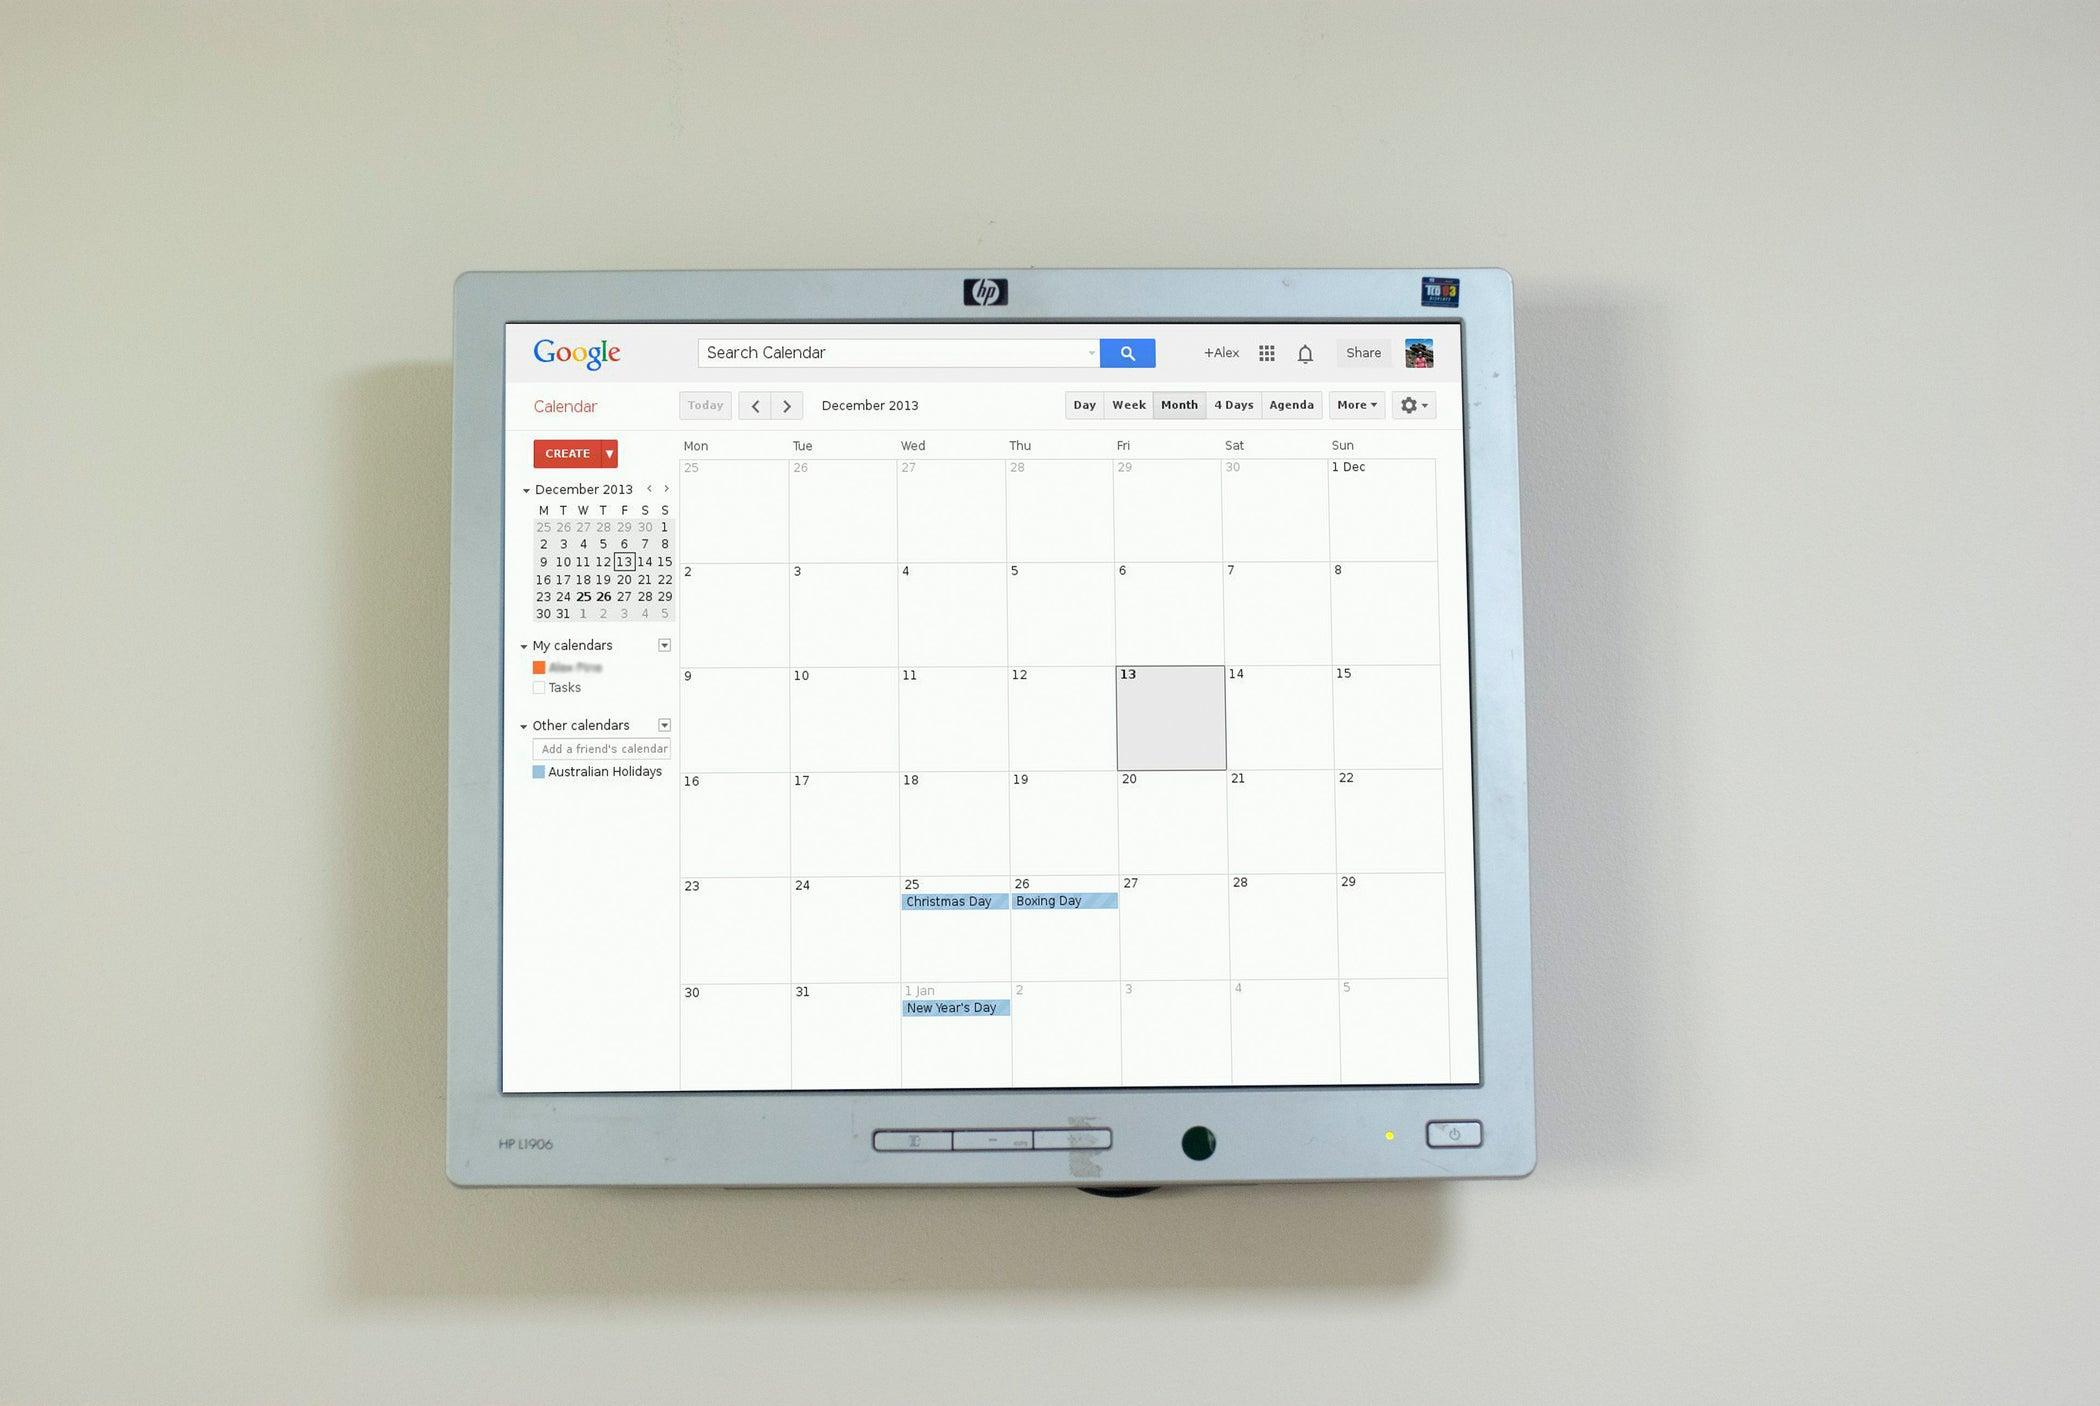 Raspberry Pi Wall Mounted Google Calendar